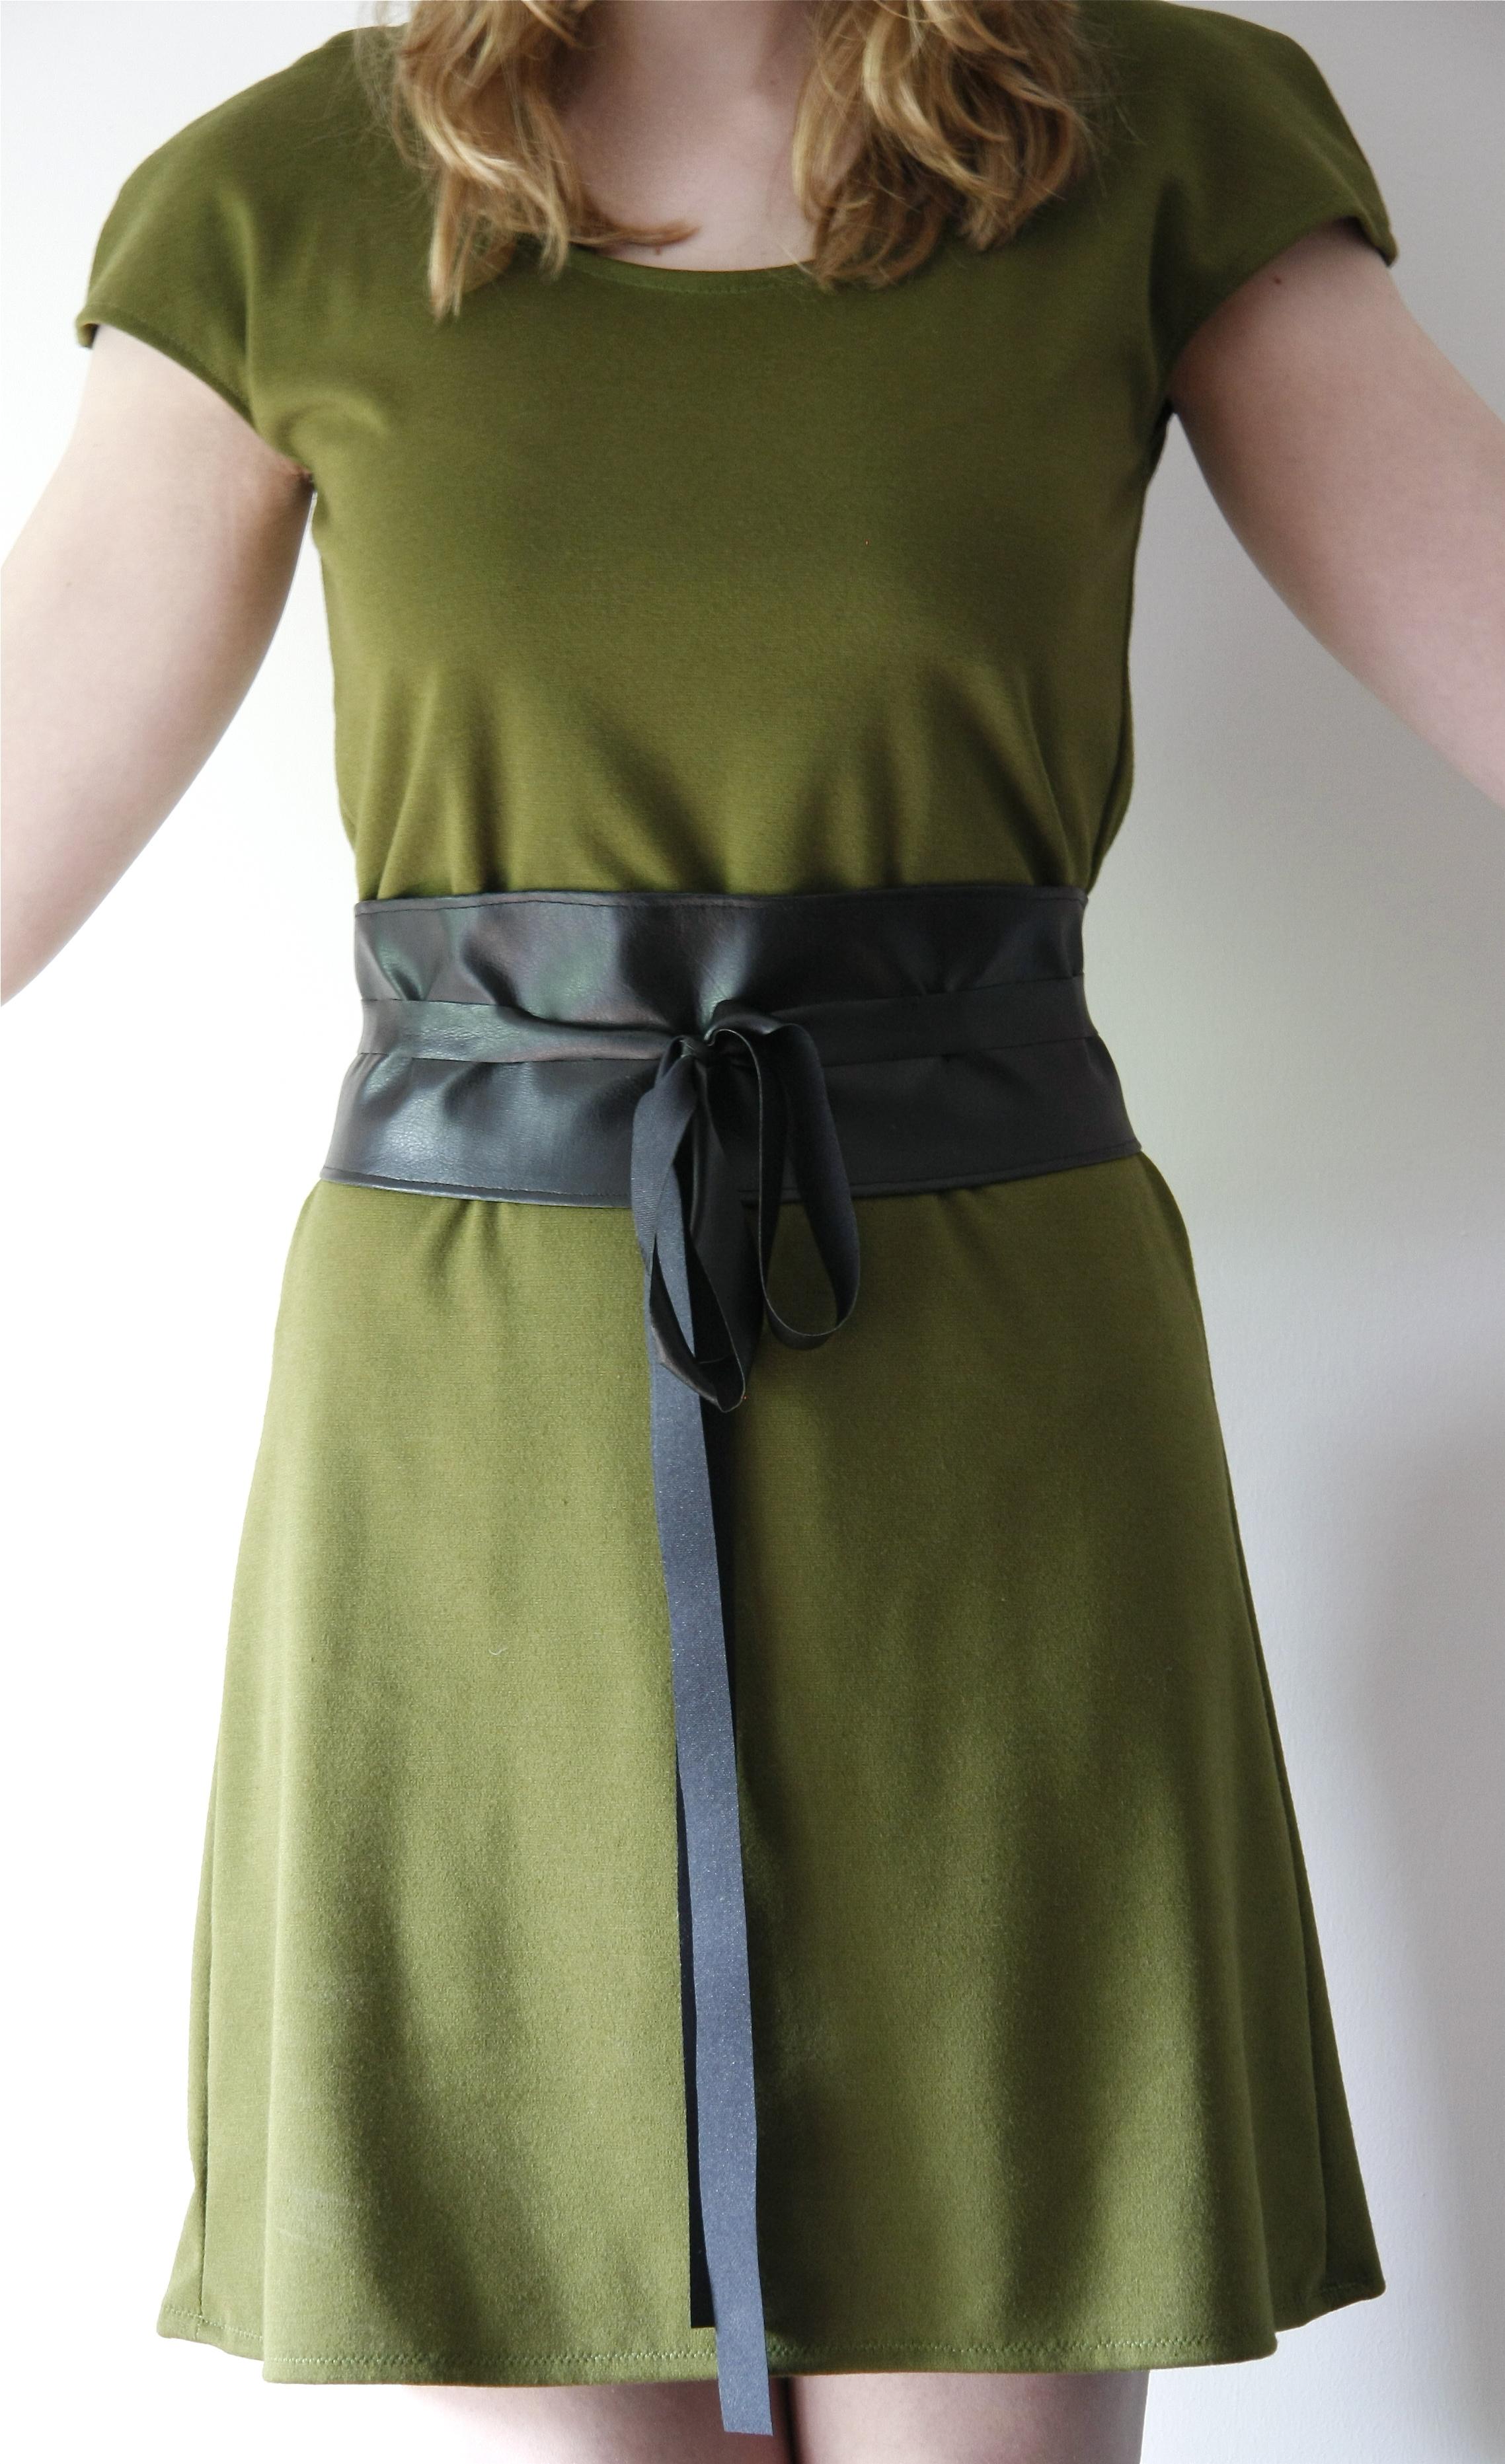 Obi Wrap Belt Sewing Projects Burdastyle Com